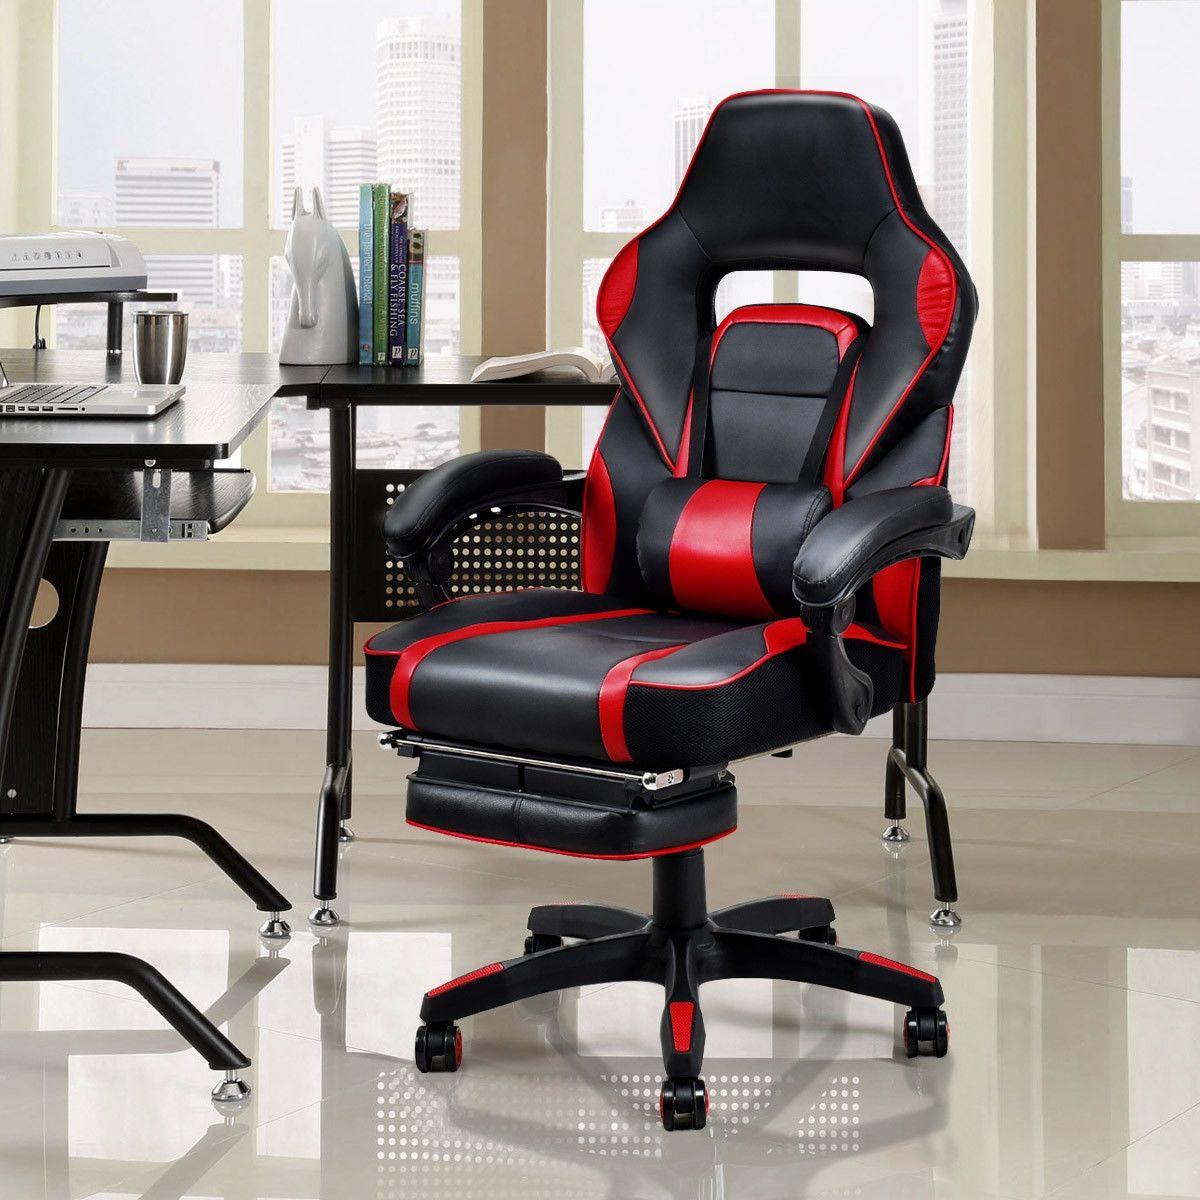 Ergonomic High Back Racing Gaming Chair Swivel Computer